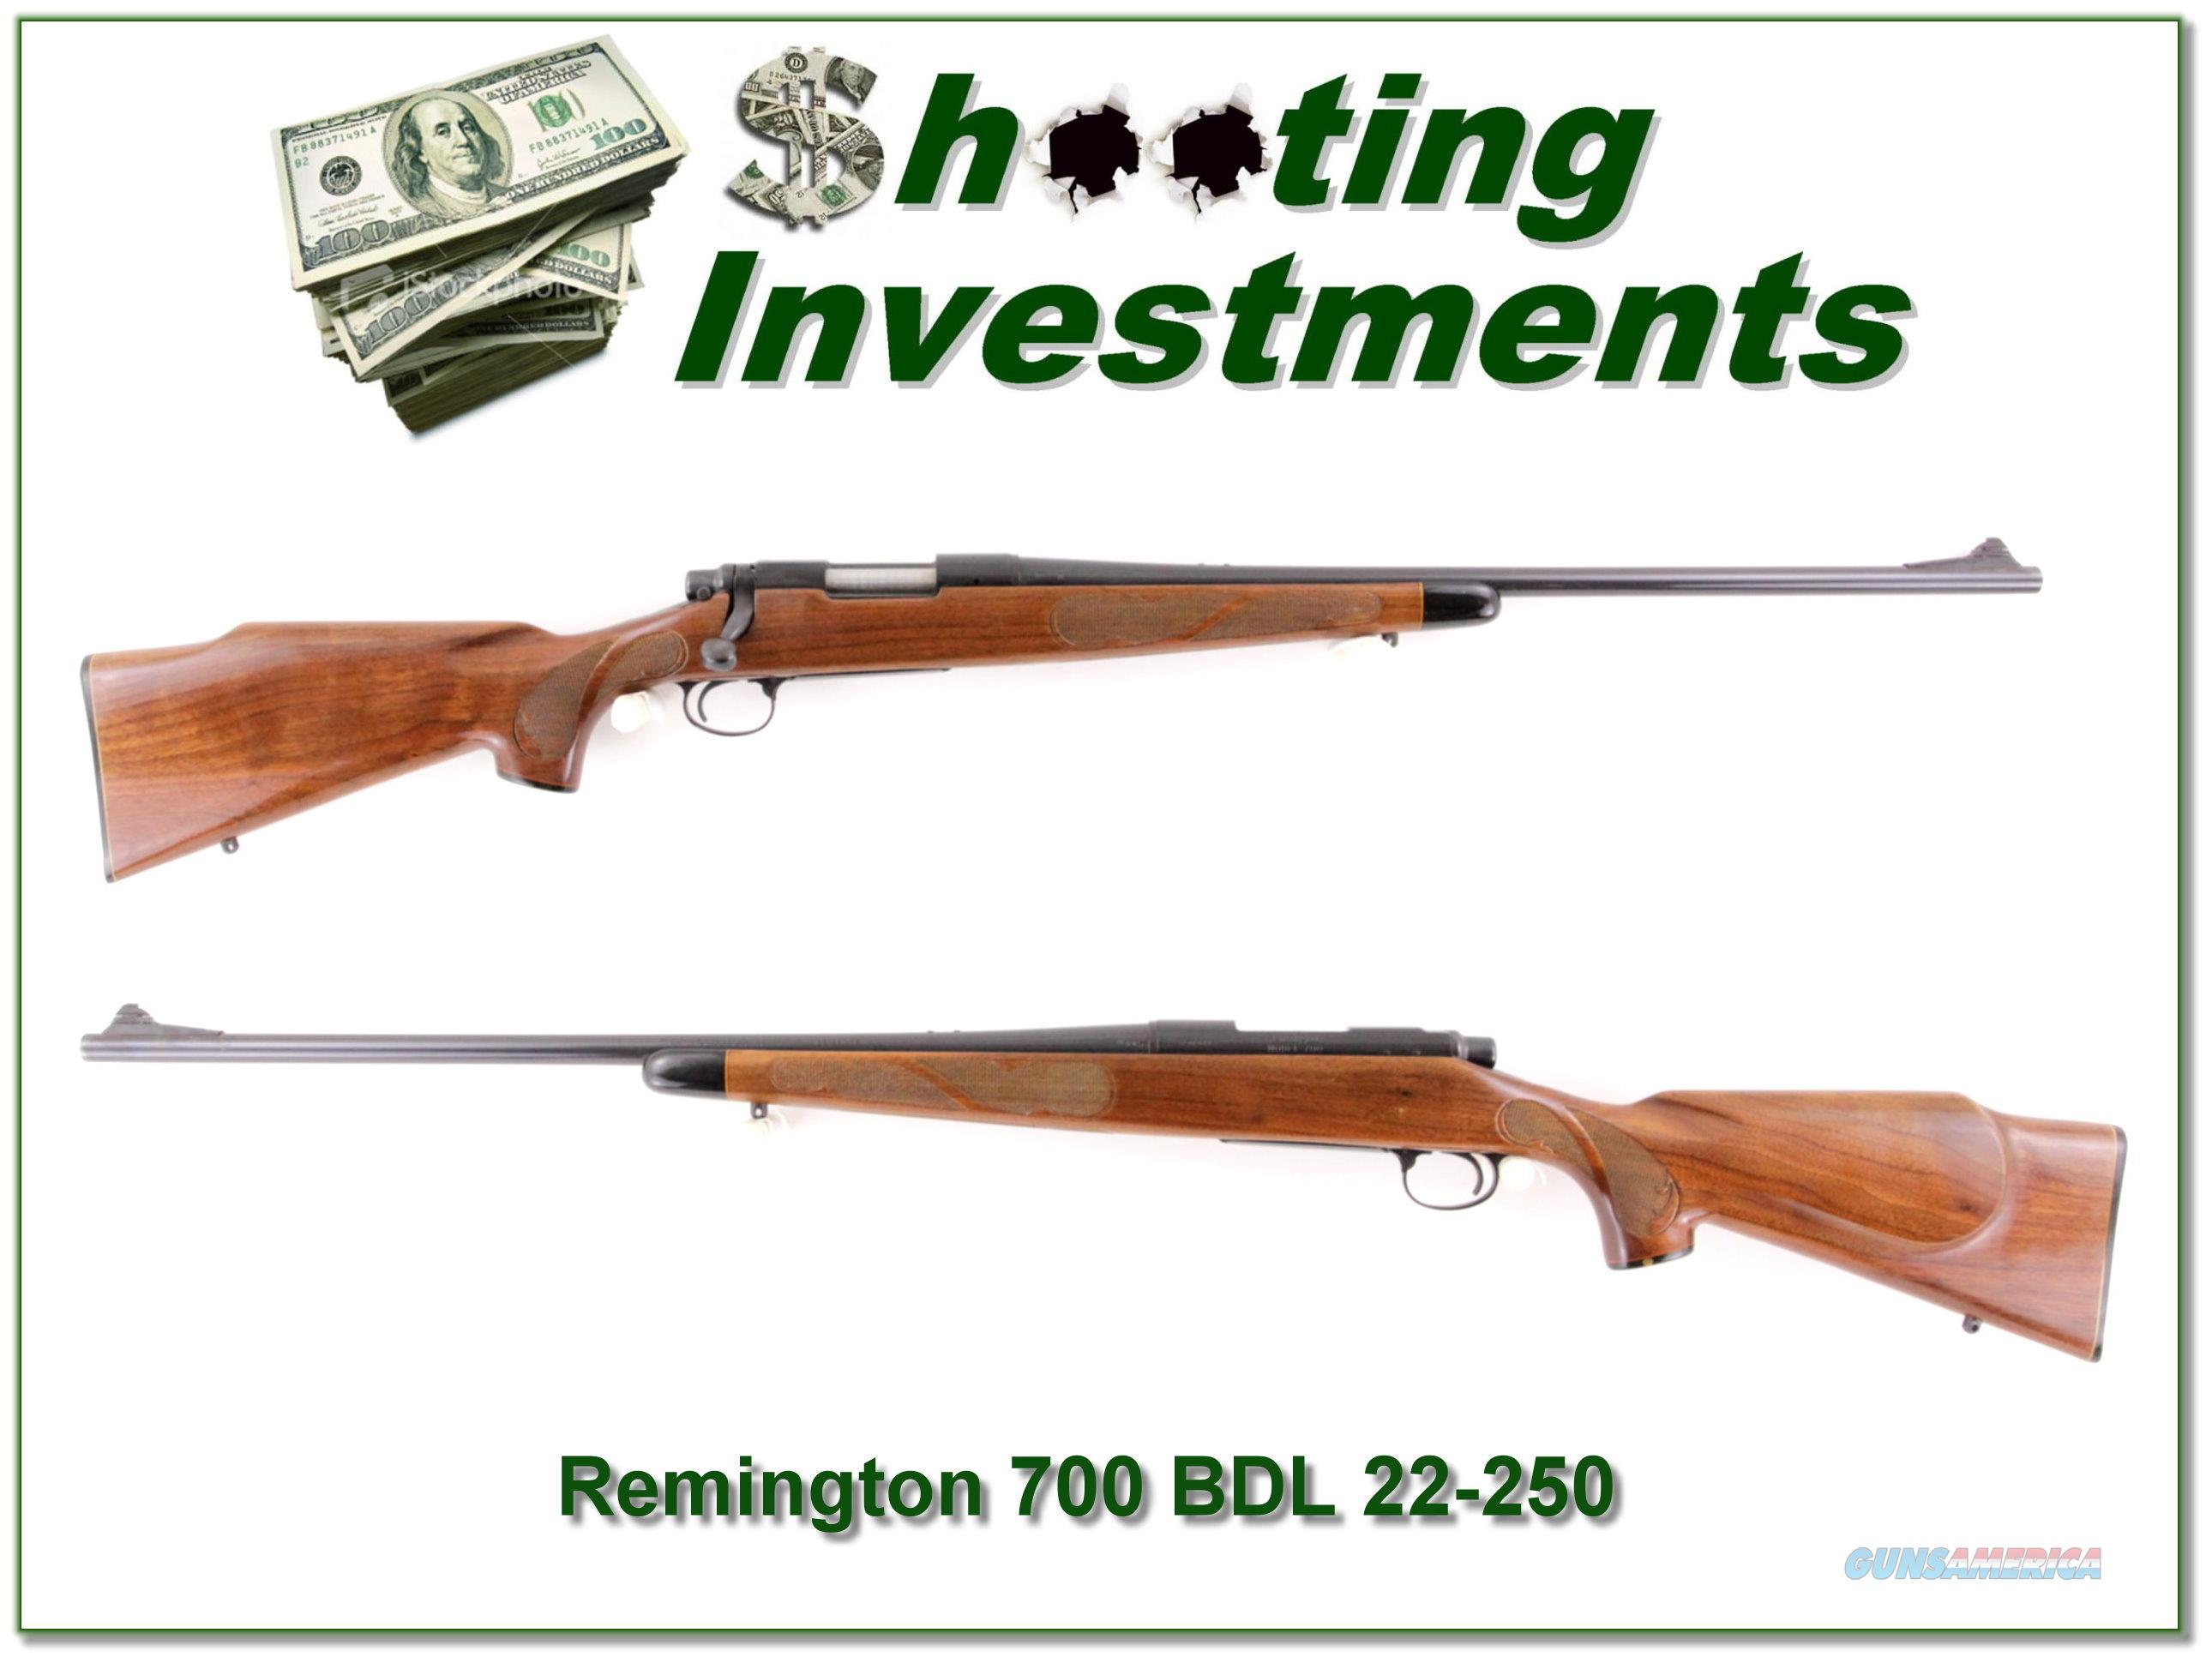 Remington 700 BDL 22-250 Pressed Checkering  Guns > Rifles > Remington Rifles - Modern > Model 700 > Sporting